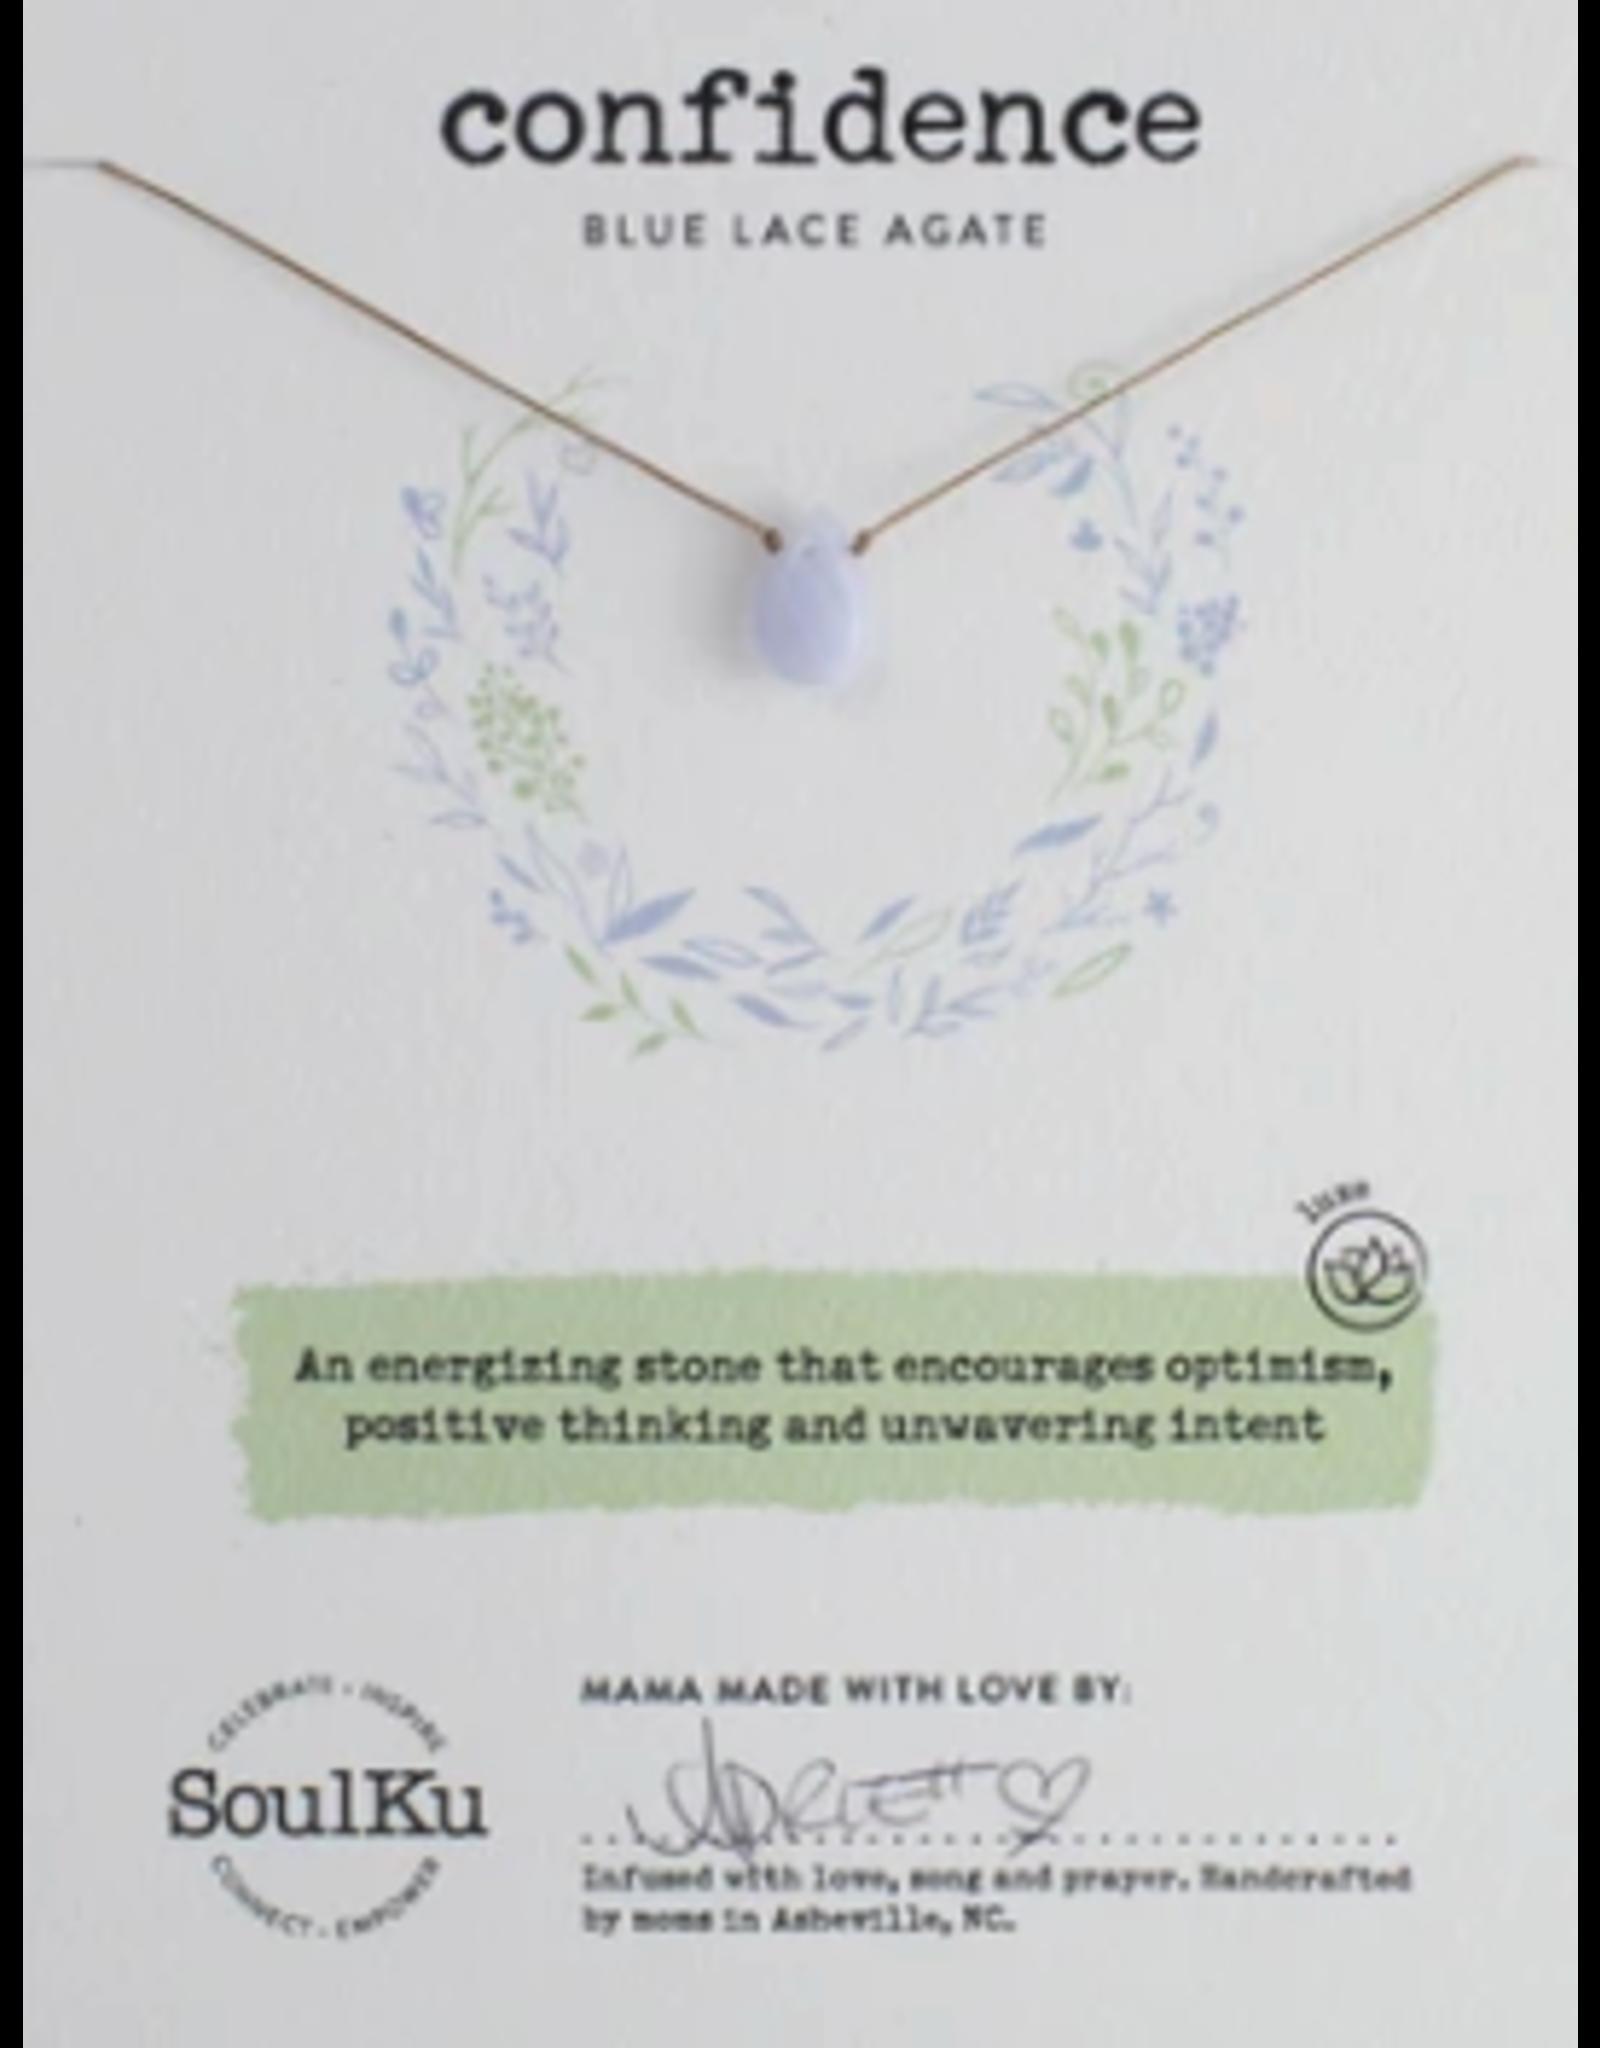 Blue Lace Agate Teardrop Necklace For Confidence - SoulKu